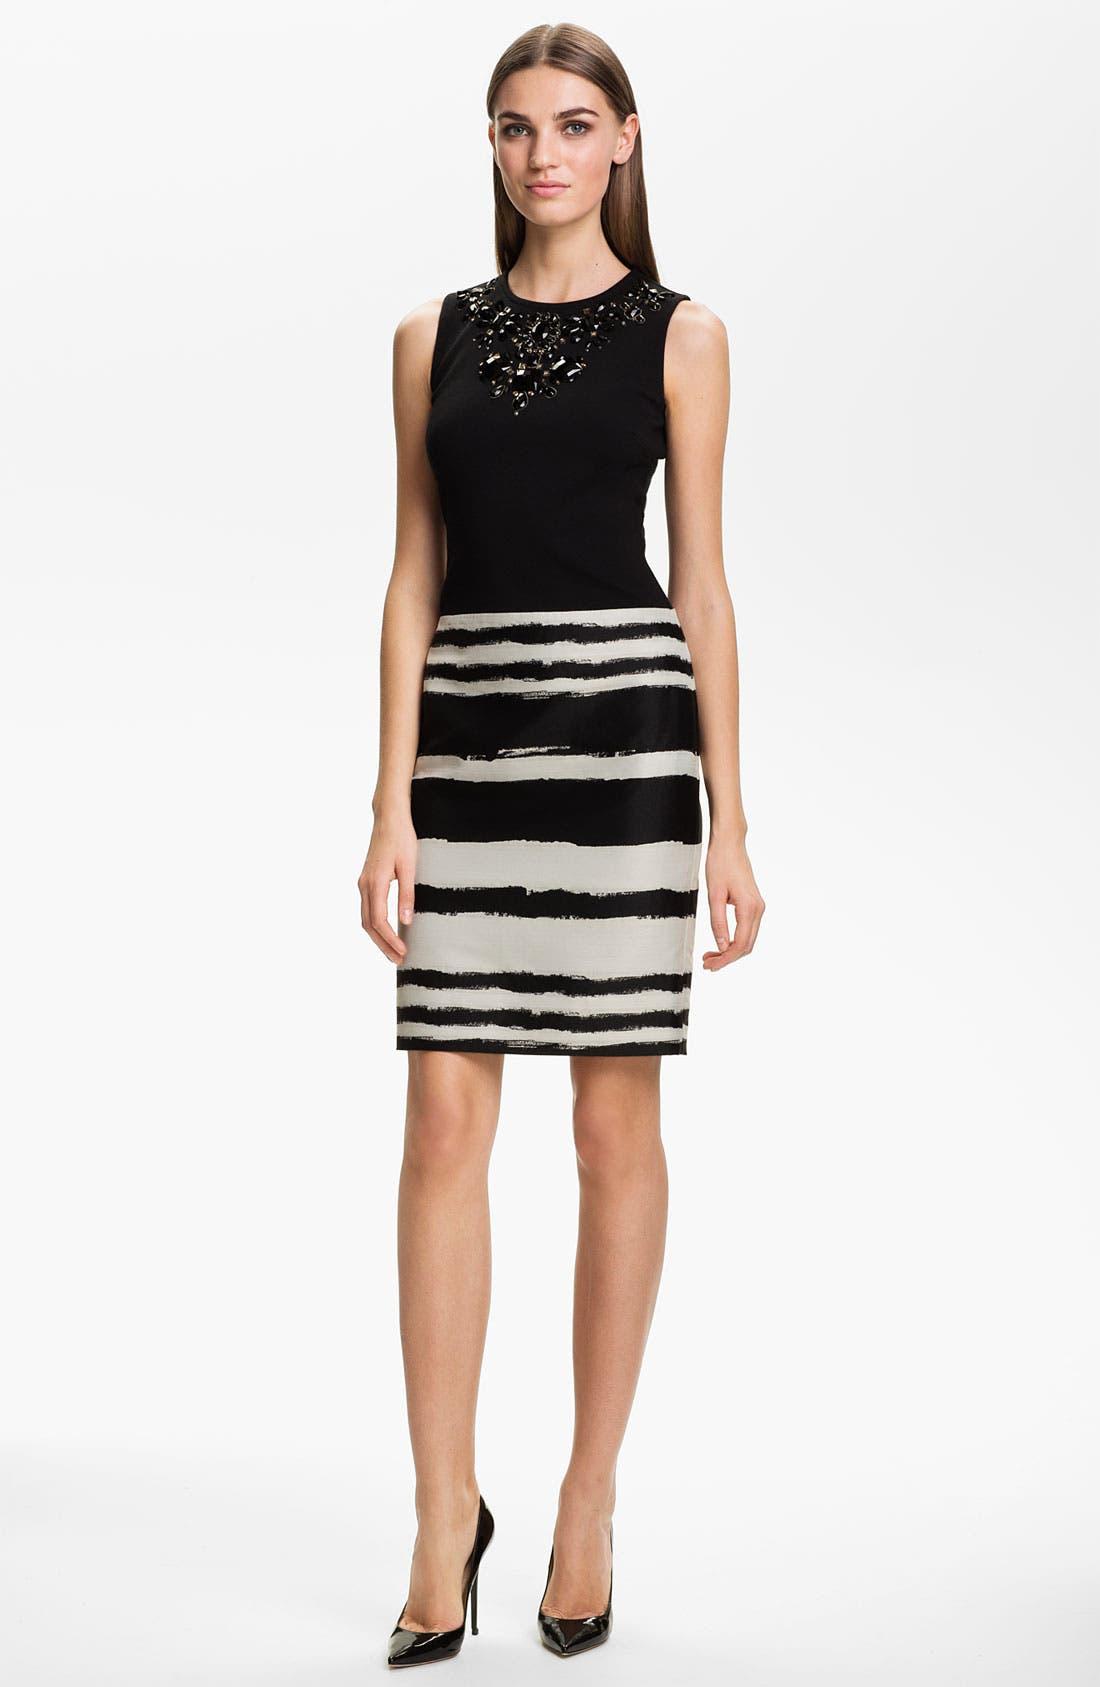 Main Image - St. John Collection Brocade & Milano Knit Beaded Dress